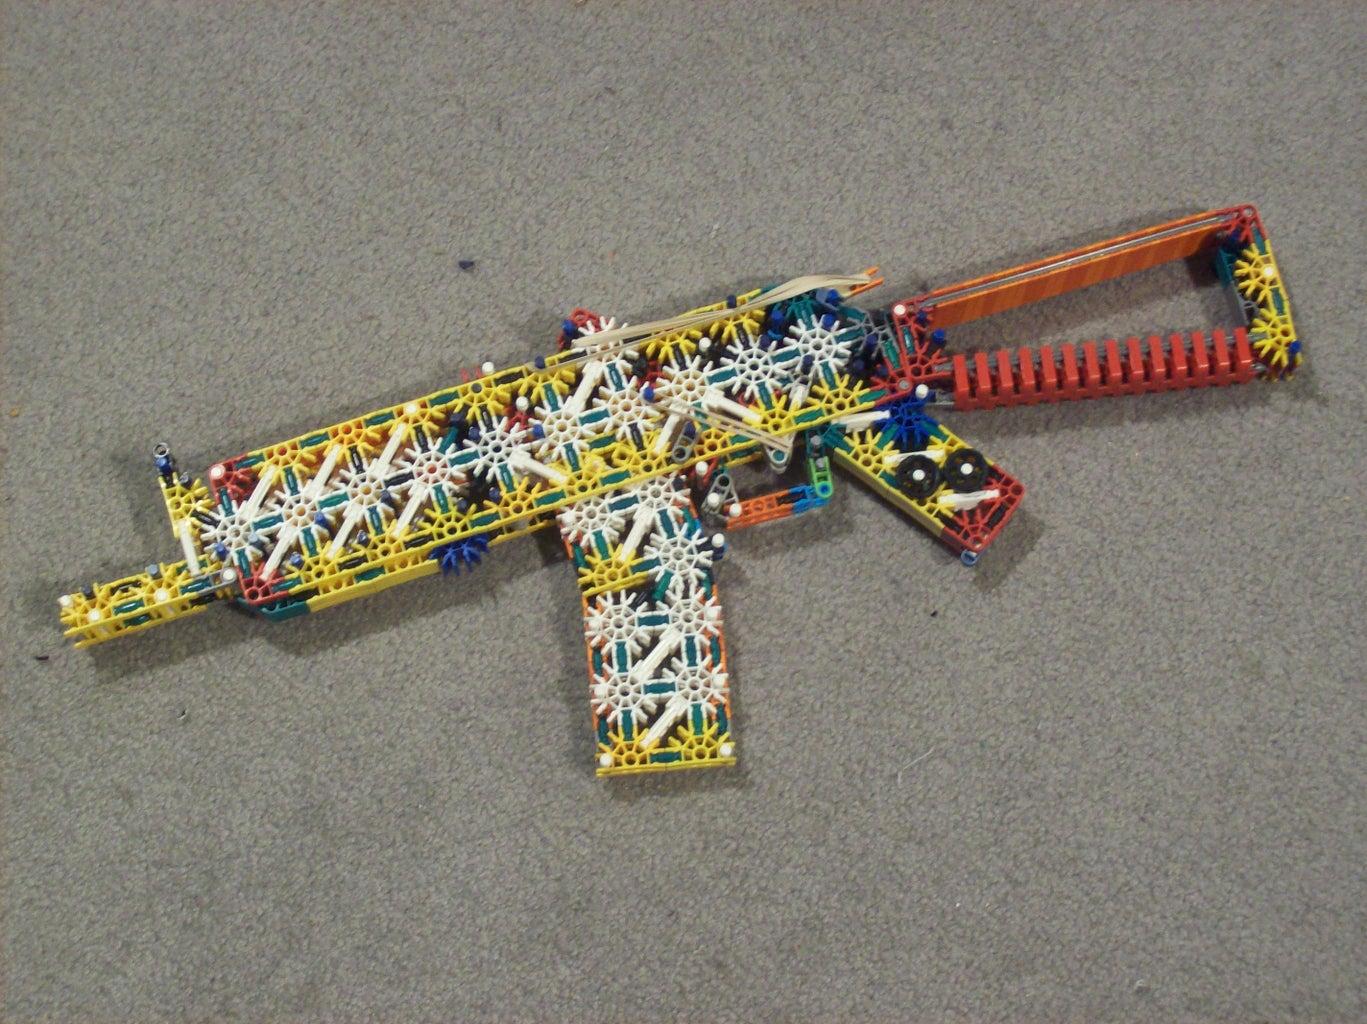 Knex AKS-74U